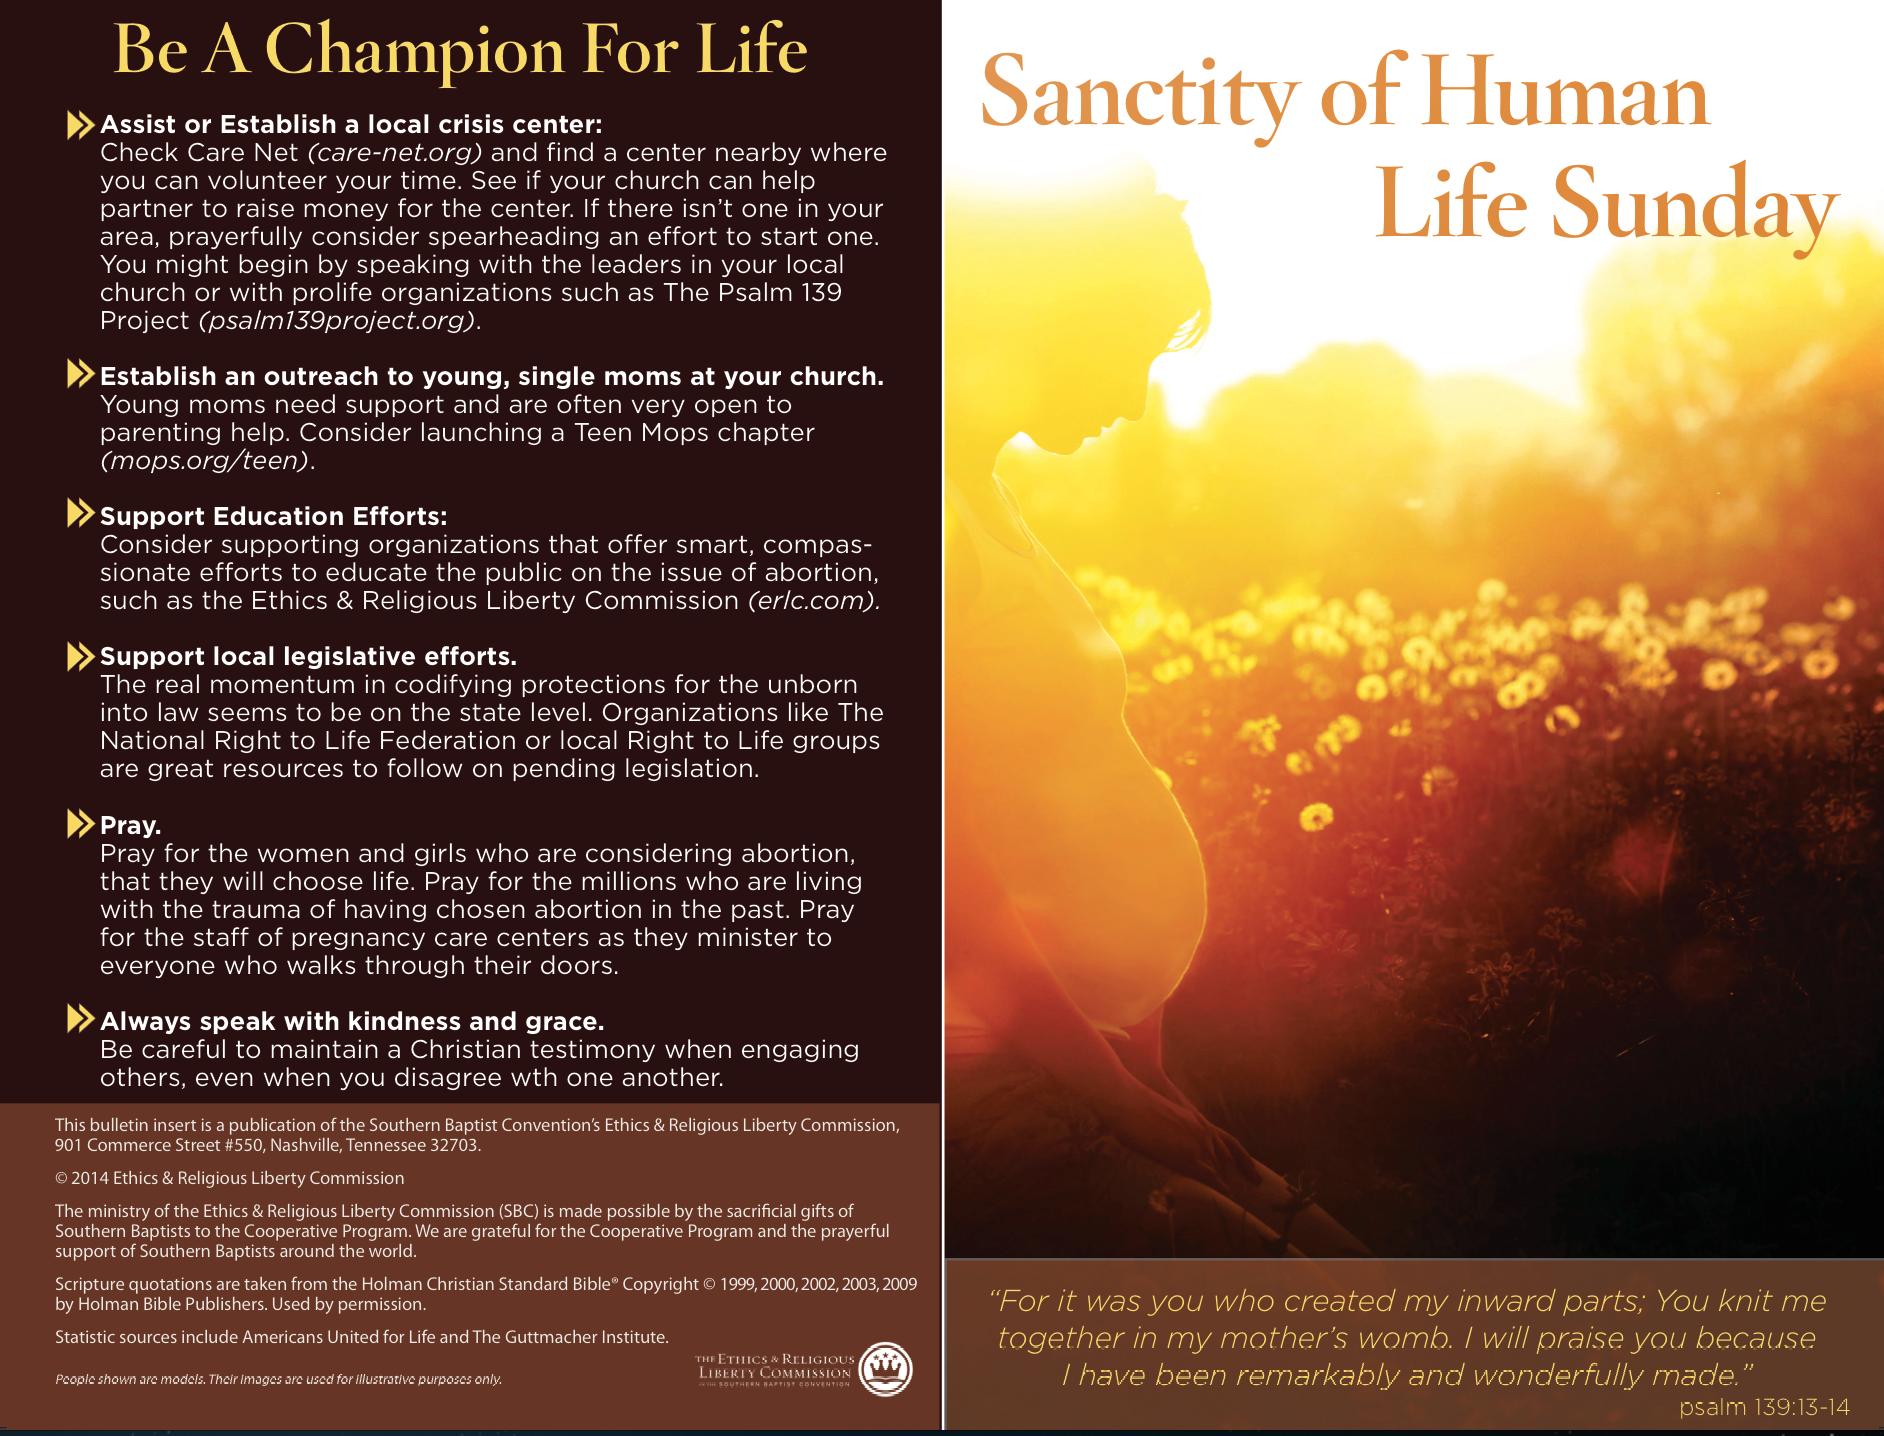 Sample church bulletin insert for Sanctity of Human Life Sunday 2014